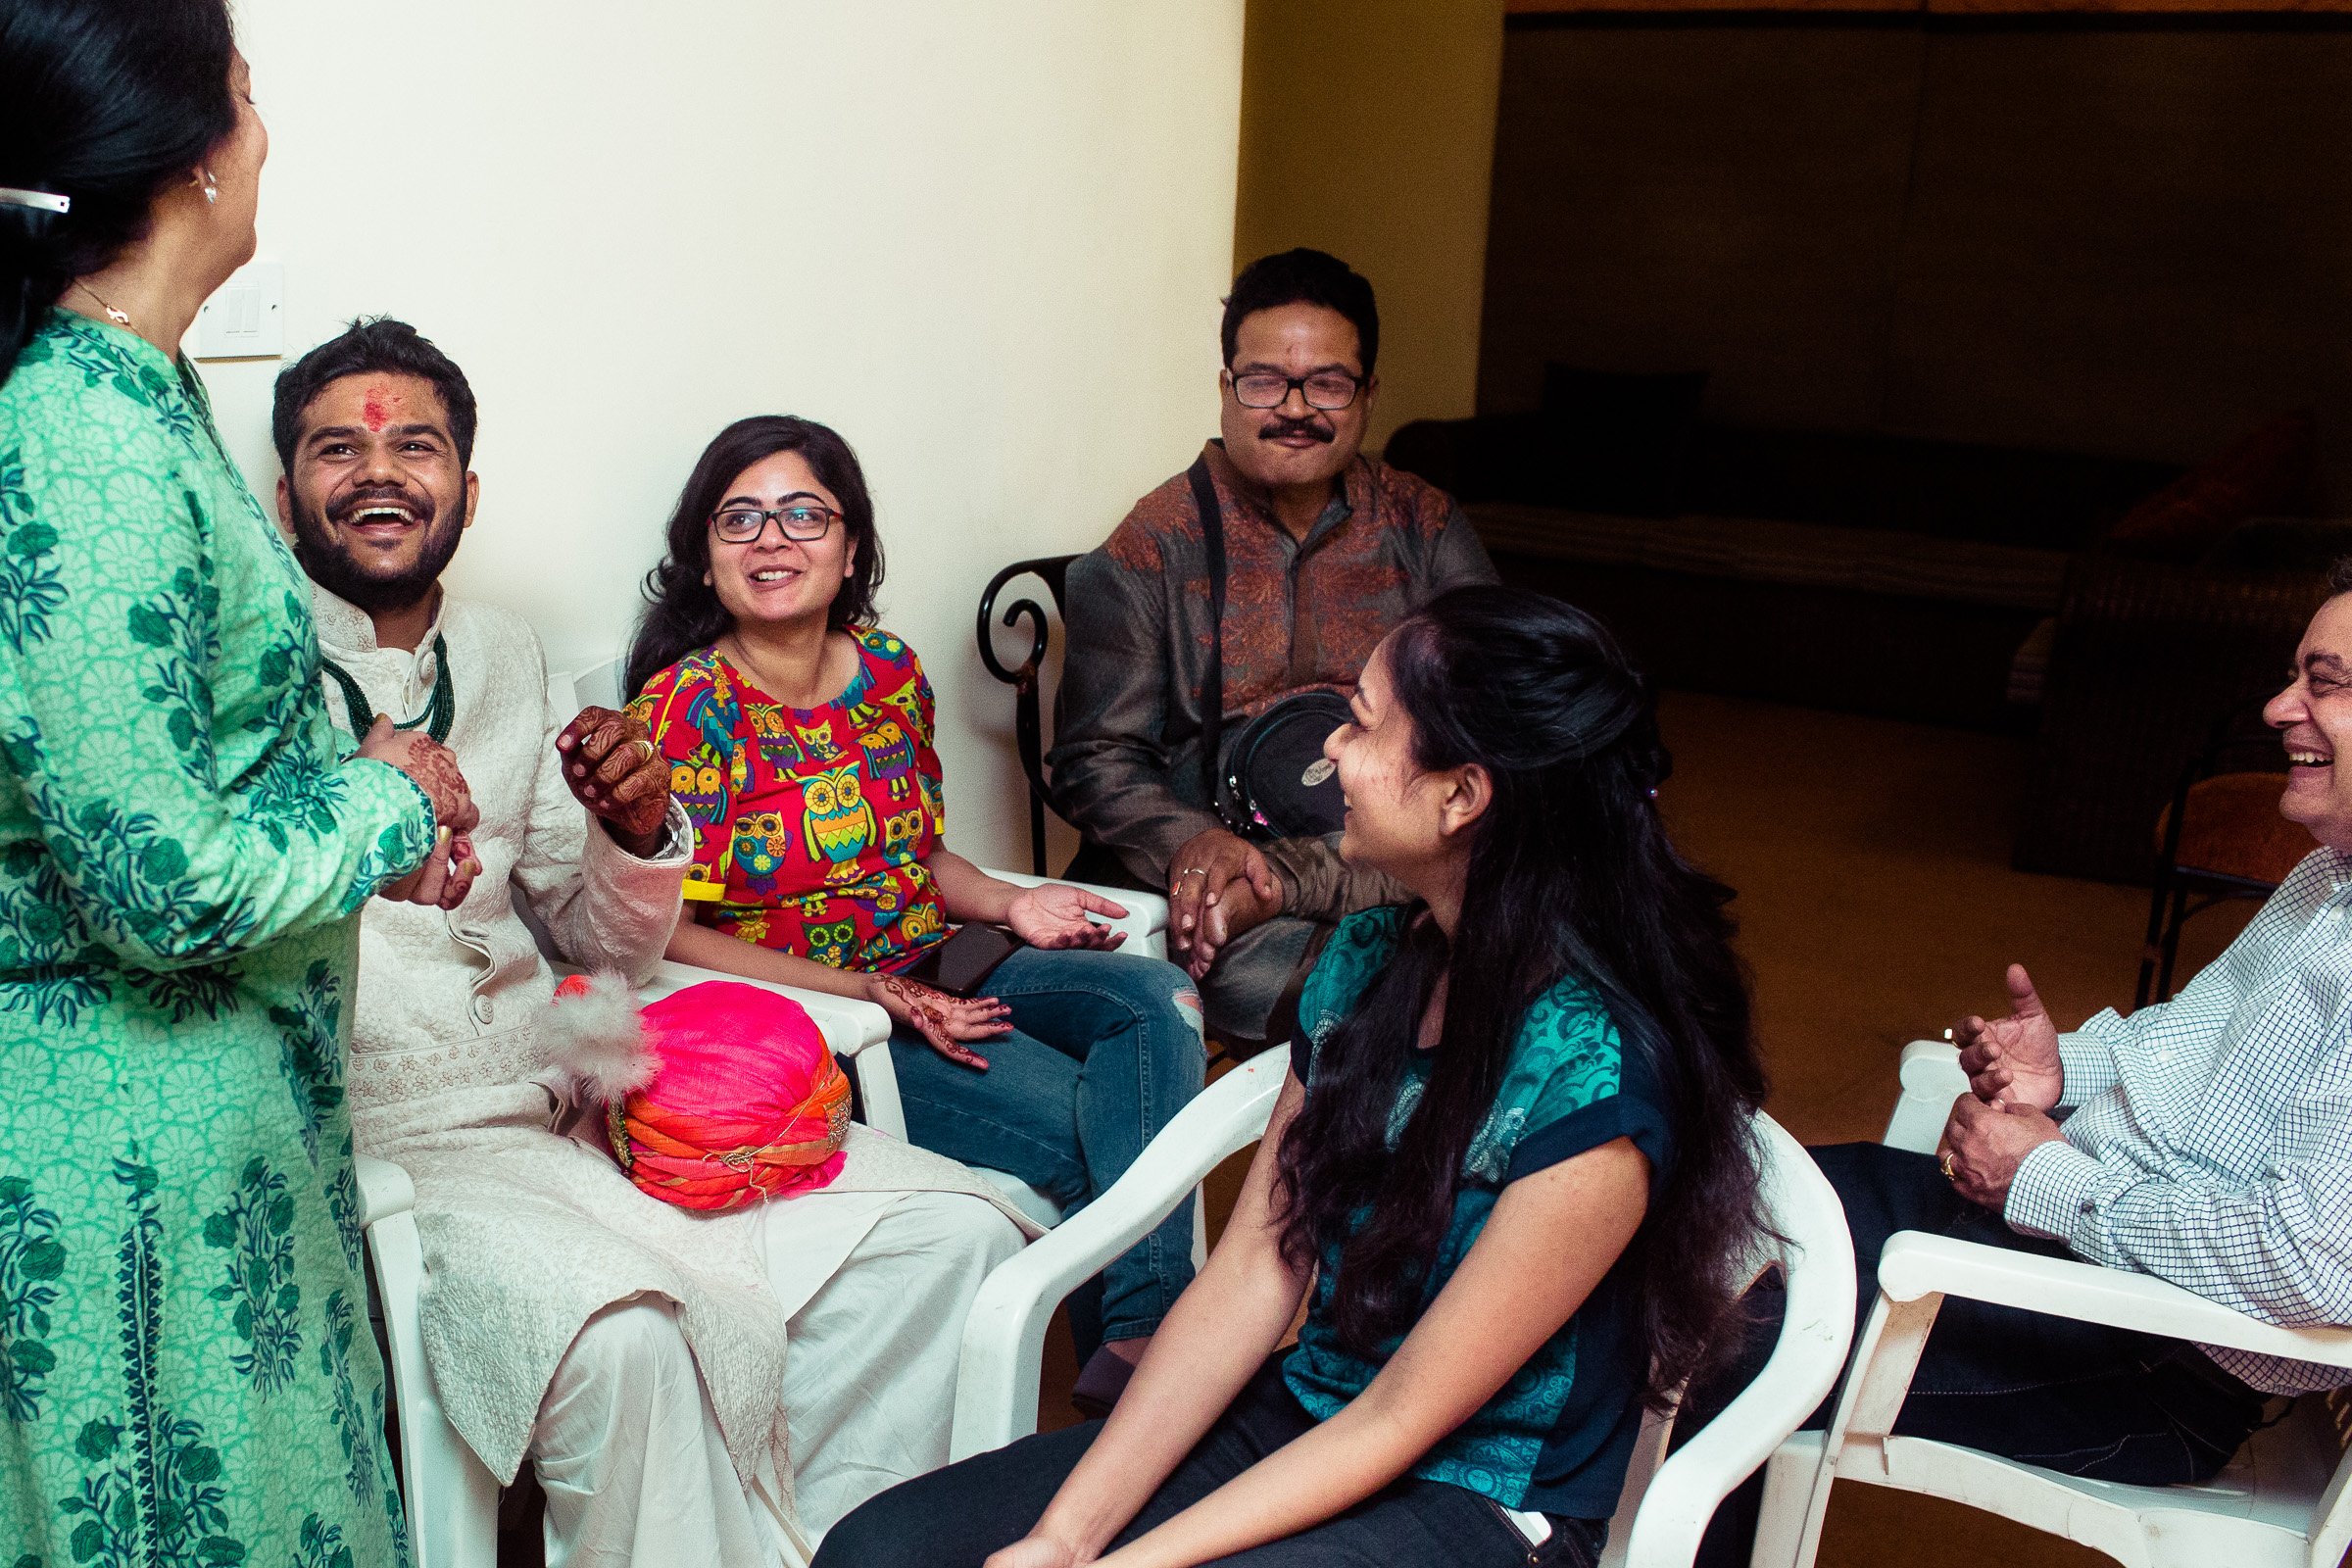 marwari-candid-wedding-photographers-bangalore-0060.jpg